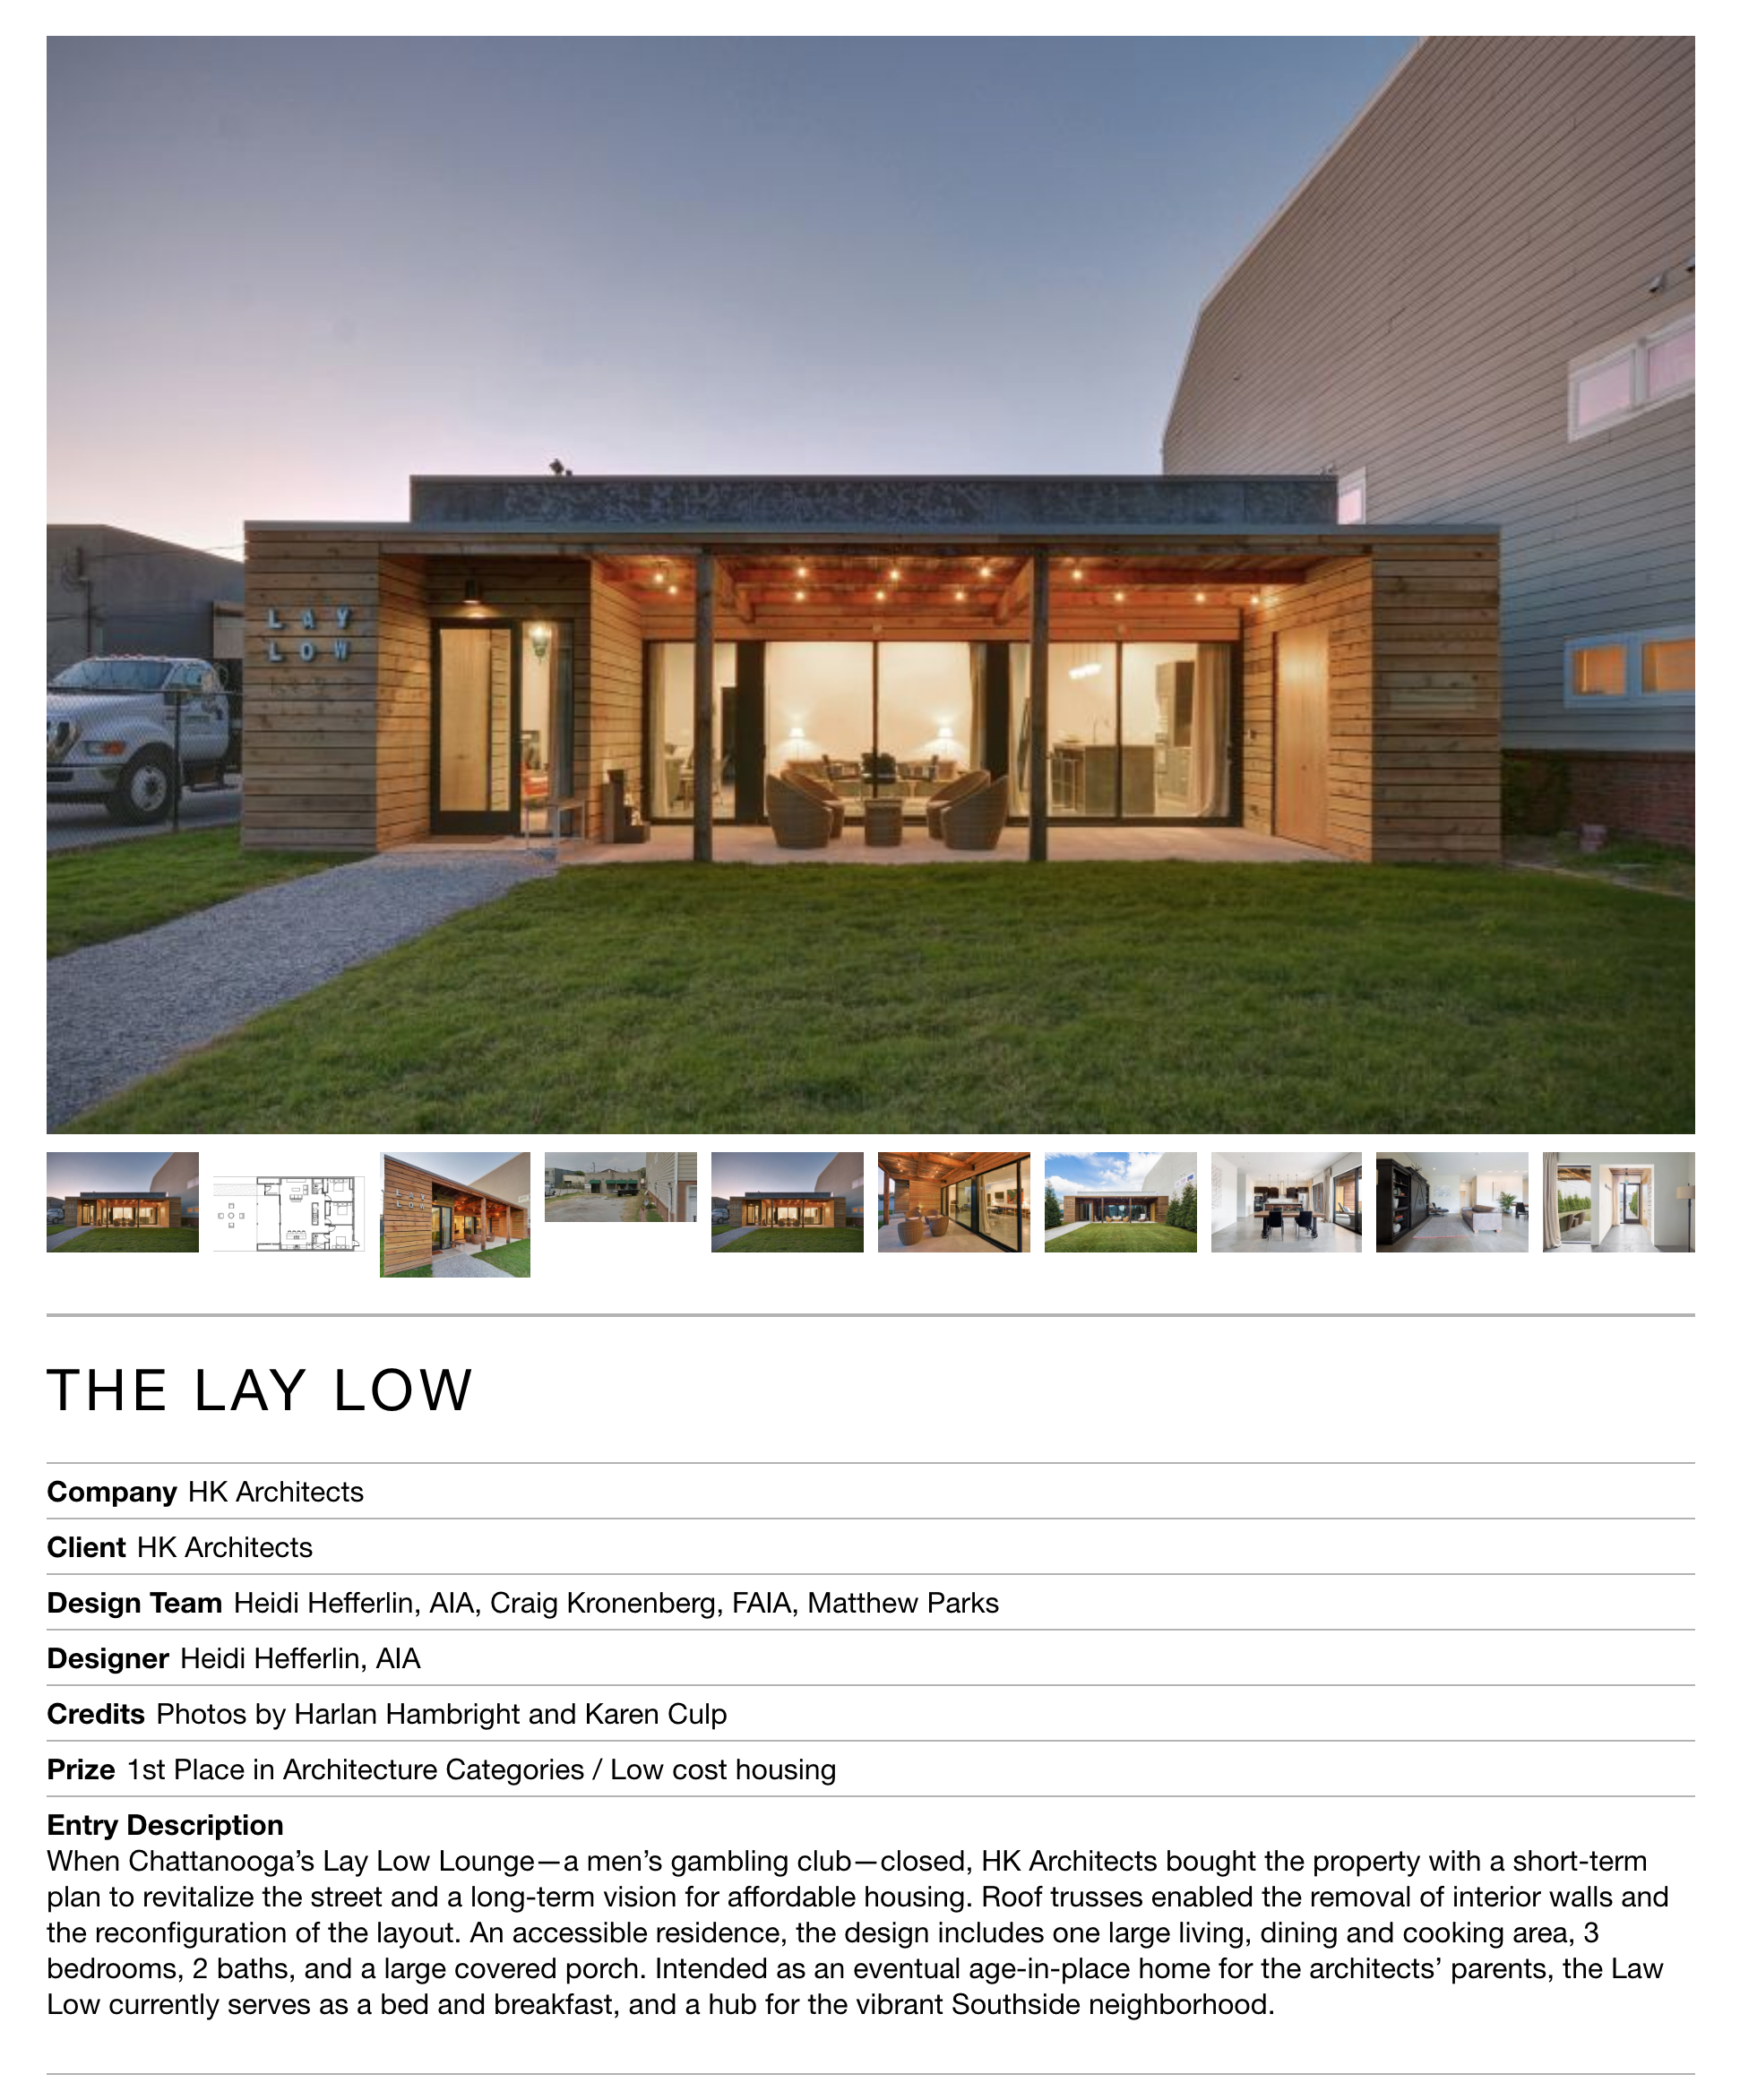 180526 IDA Design Award 2018 HK Architects Lay Low.png